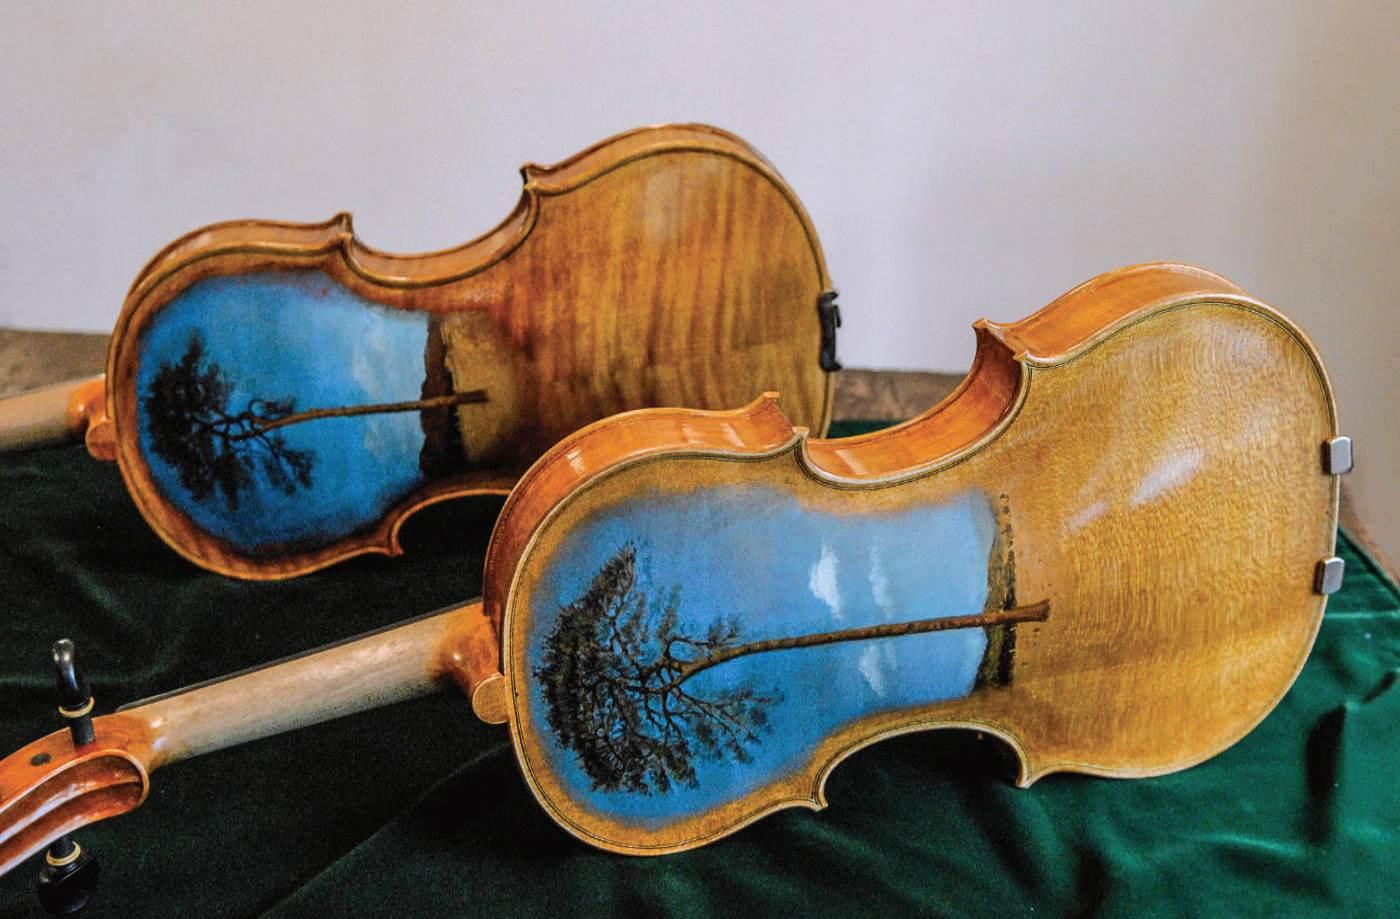 Two Tsunami Violins created by Muneyuki Nakazawa